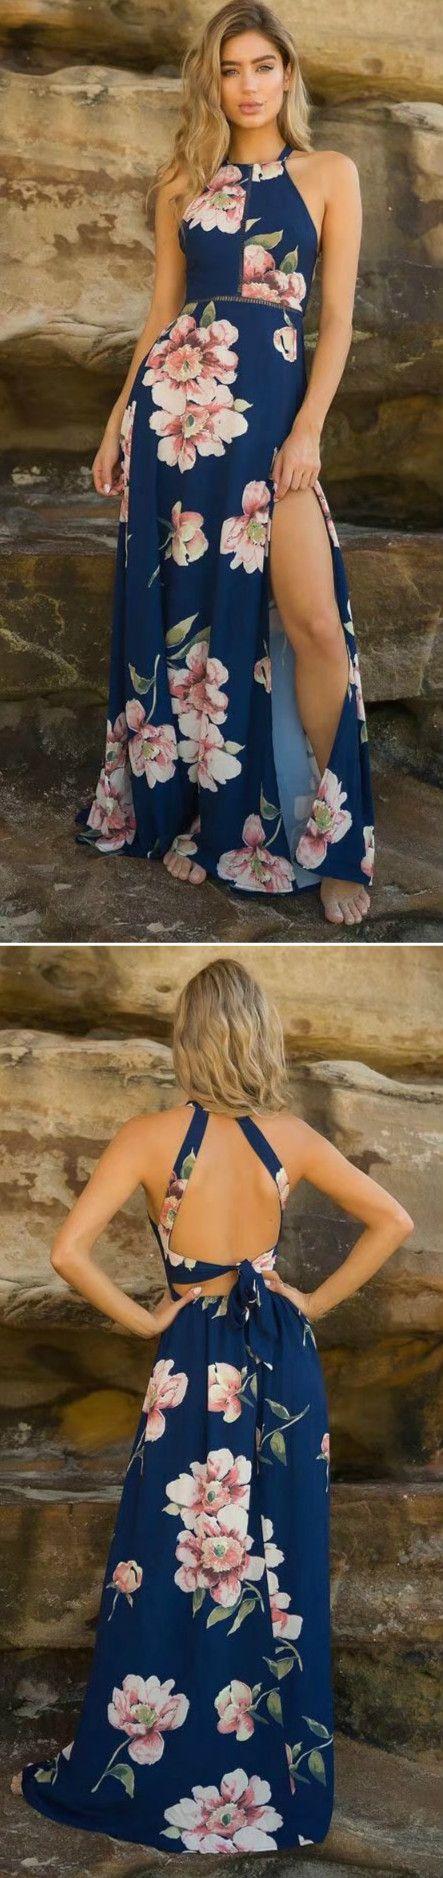 Longue robe bleue fleurie